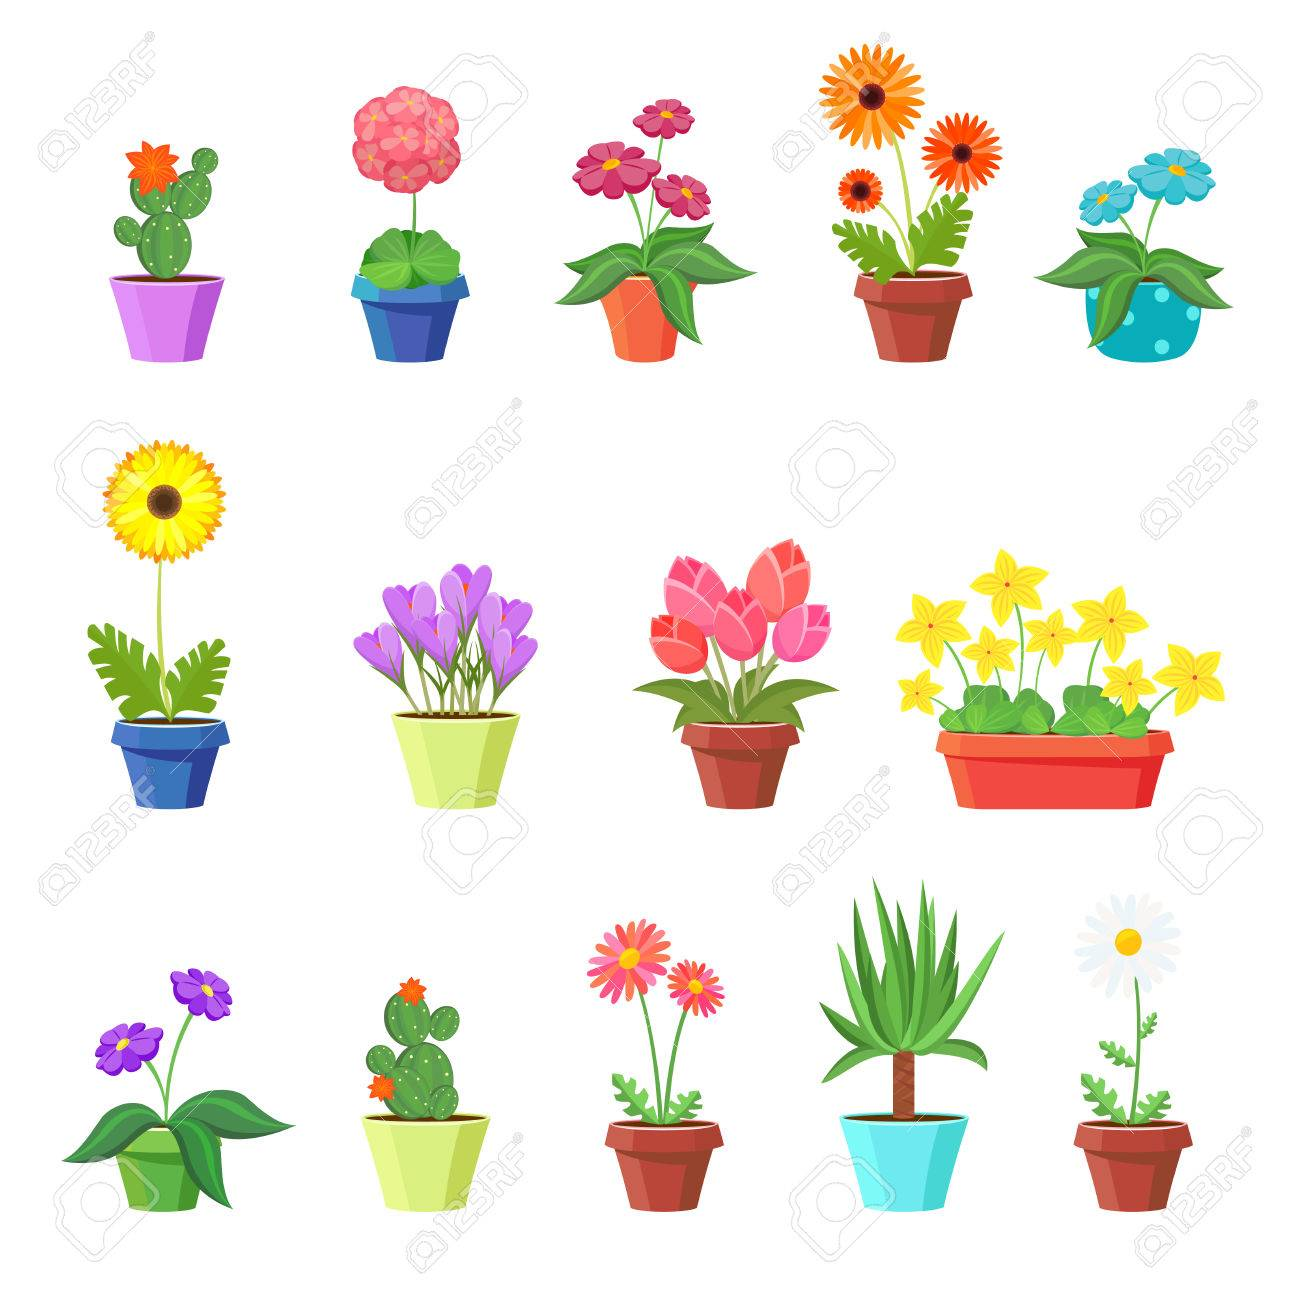 Cute spring flower - Cute Spring Flowers In Pots Vector Flower Spring Flower Pot Floral Plant